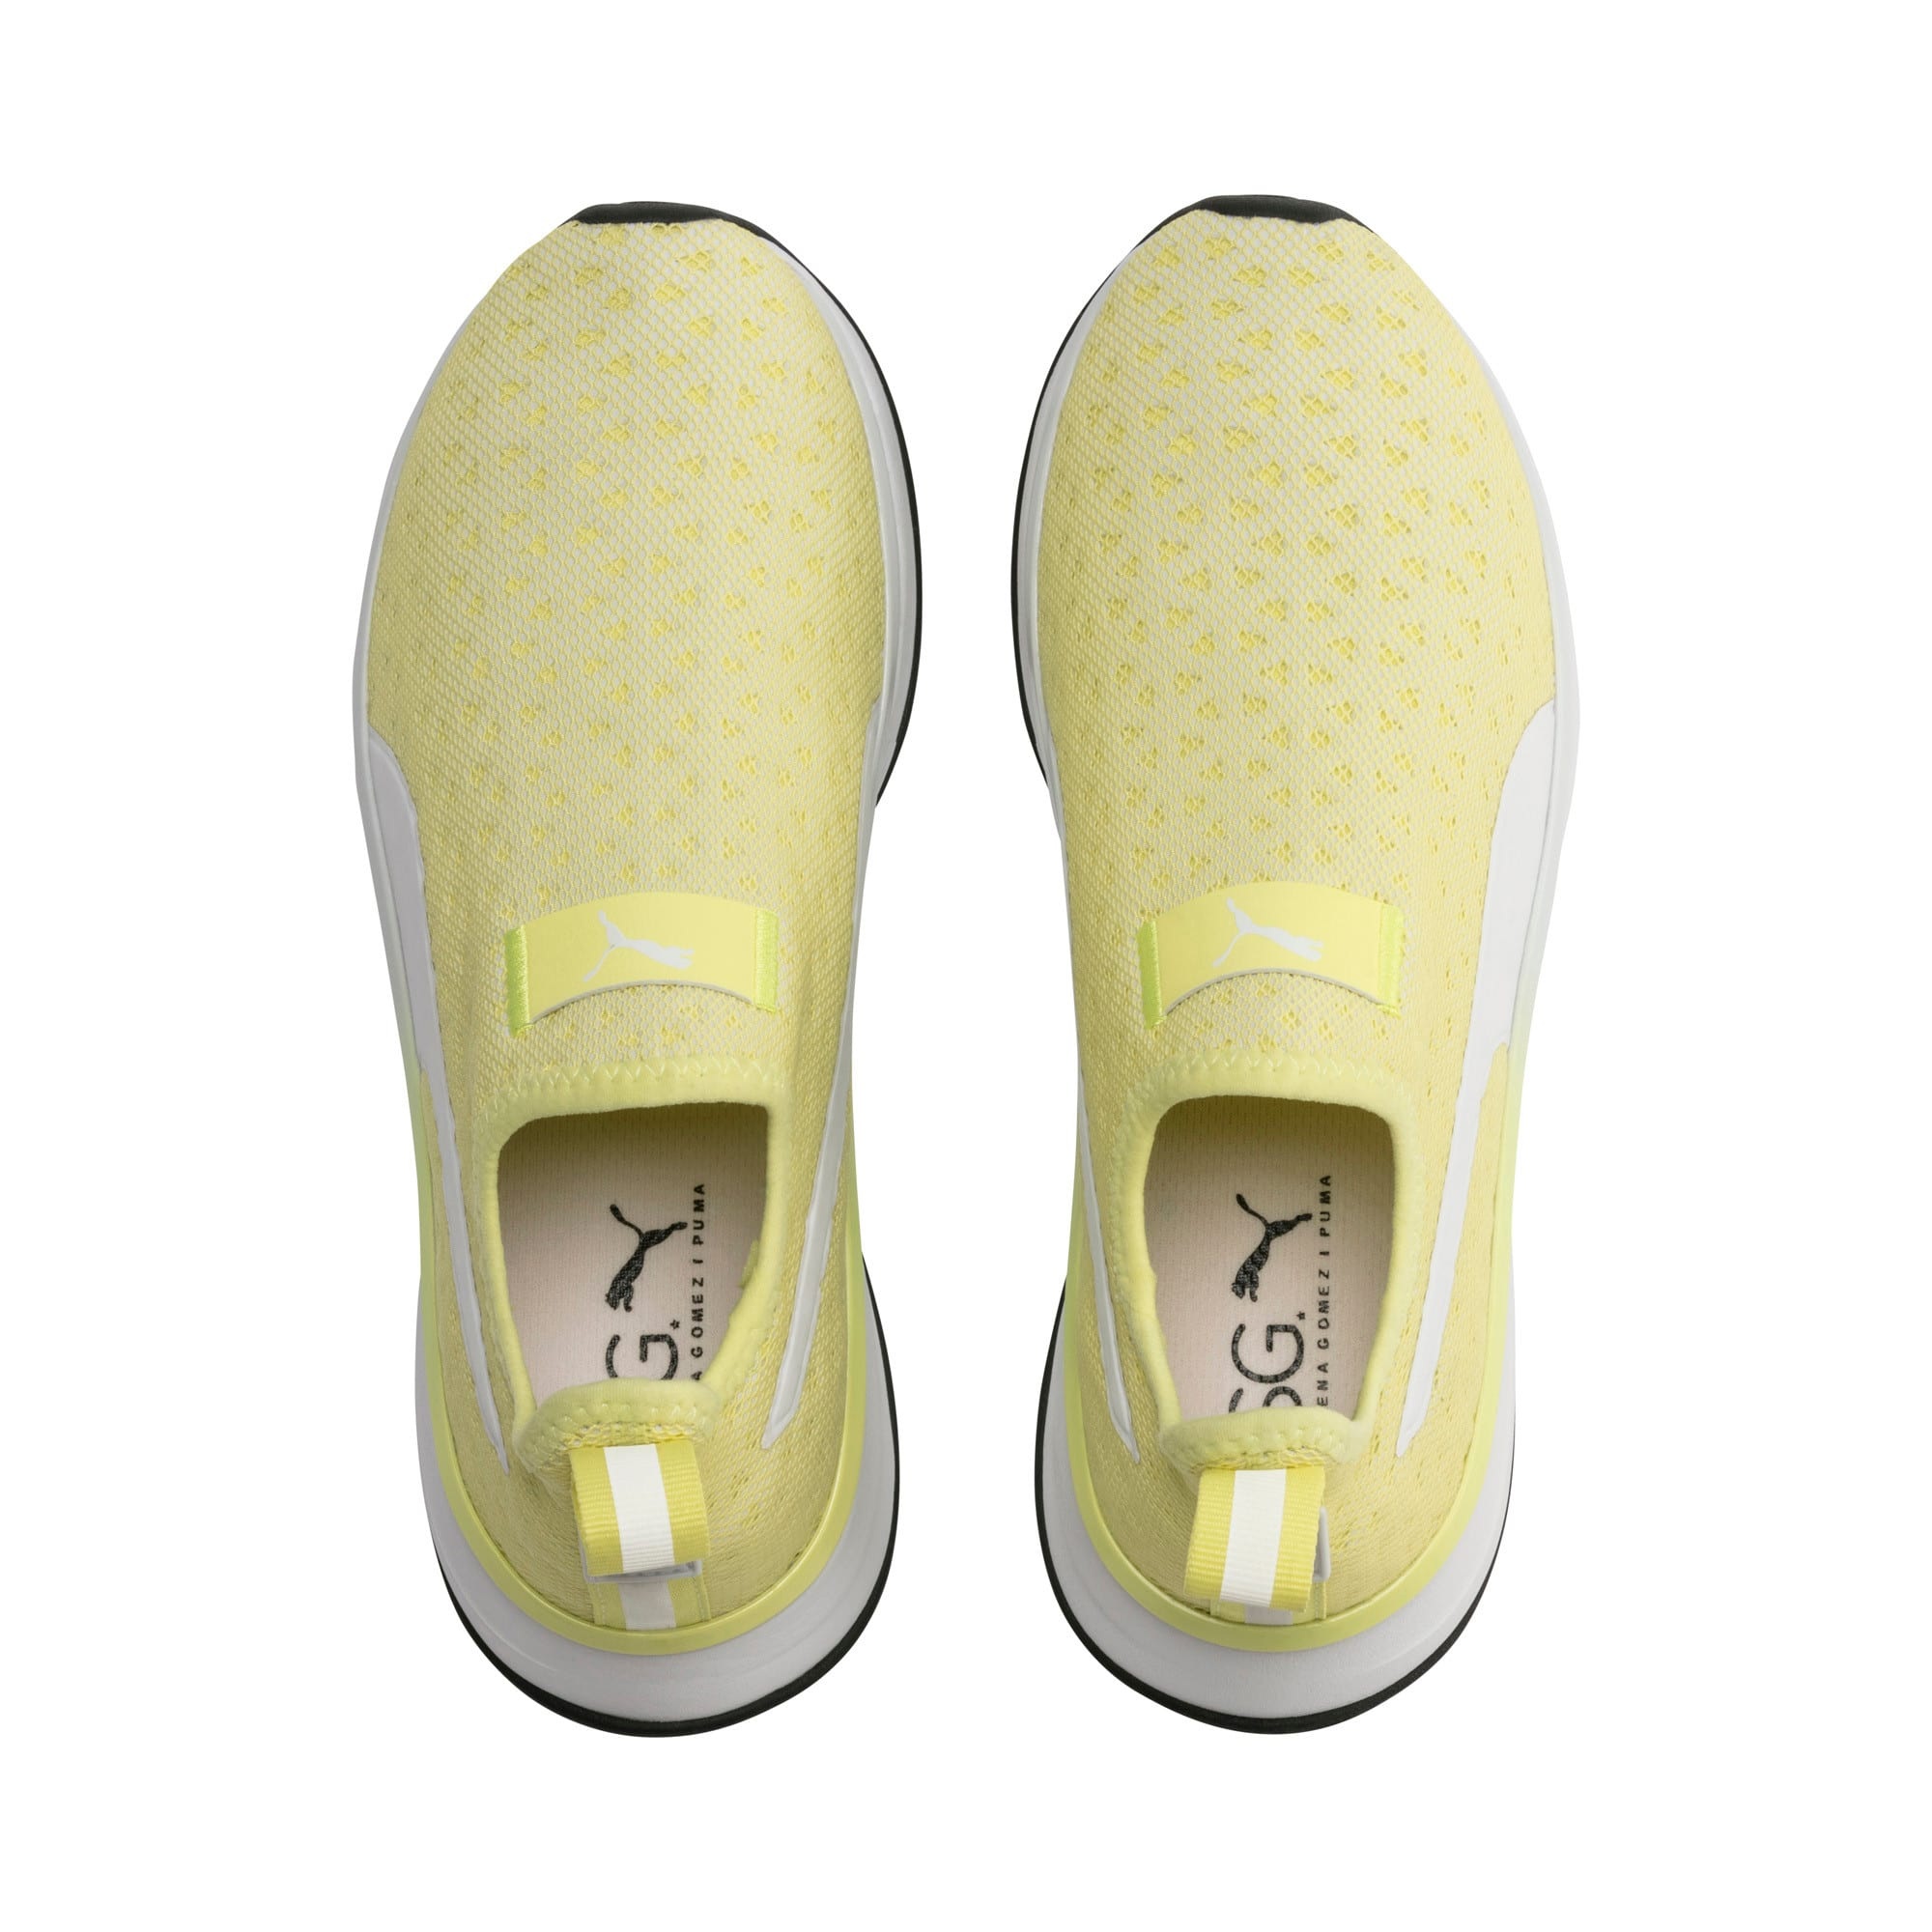 Thumbnail 7 of SG Slip-on Bright Women's Training Shoes, YELLOW-Puma White-Puma Black, medium